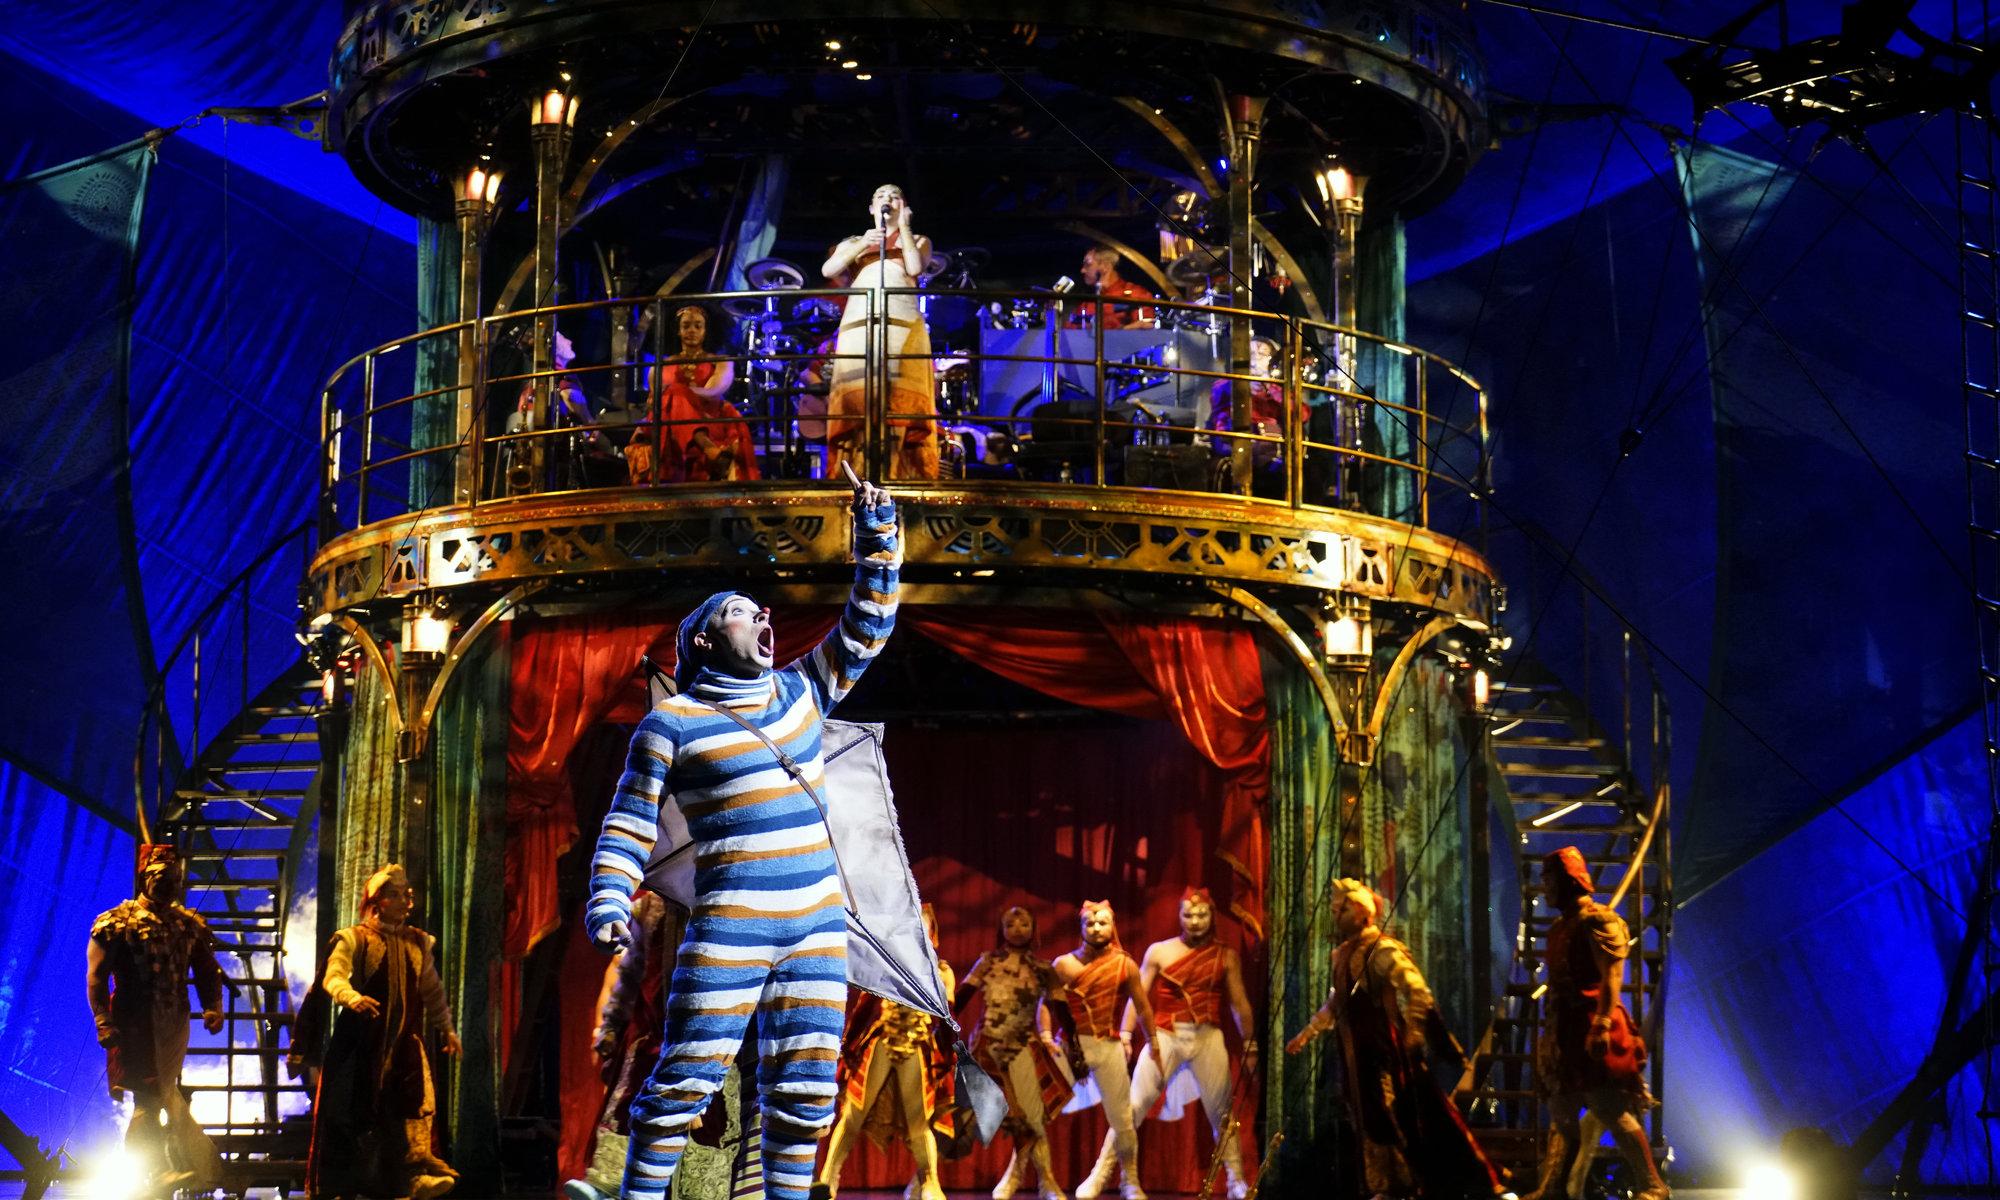 Kooza Cirque Du Soleil